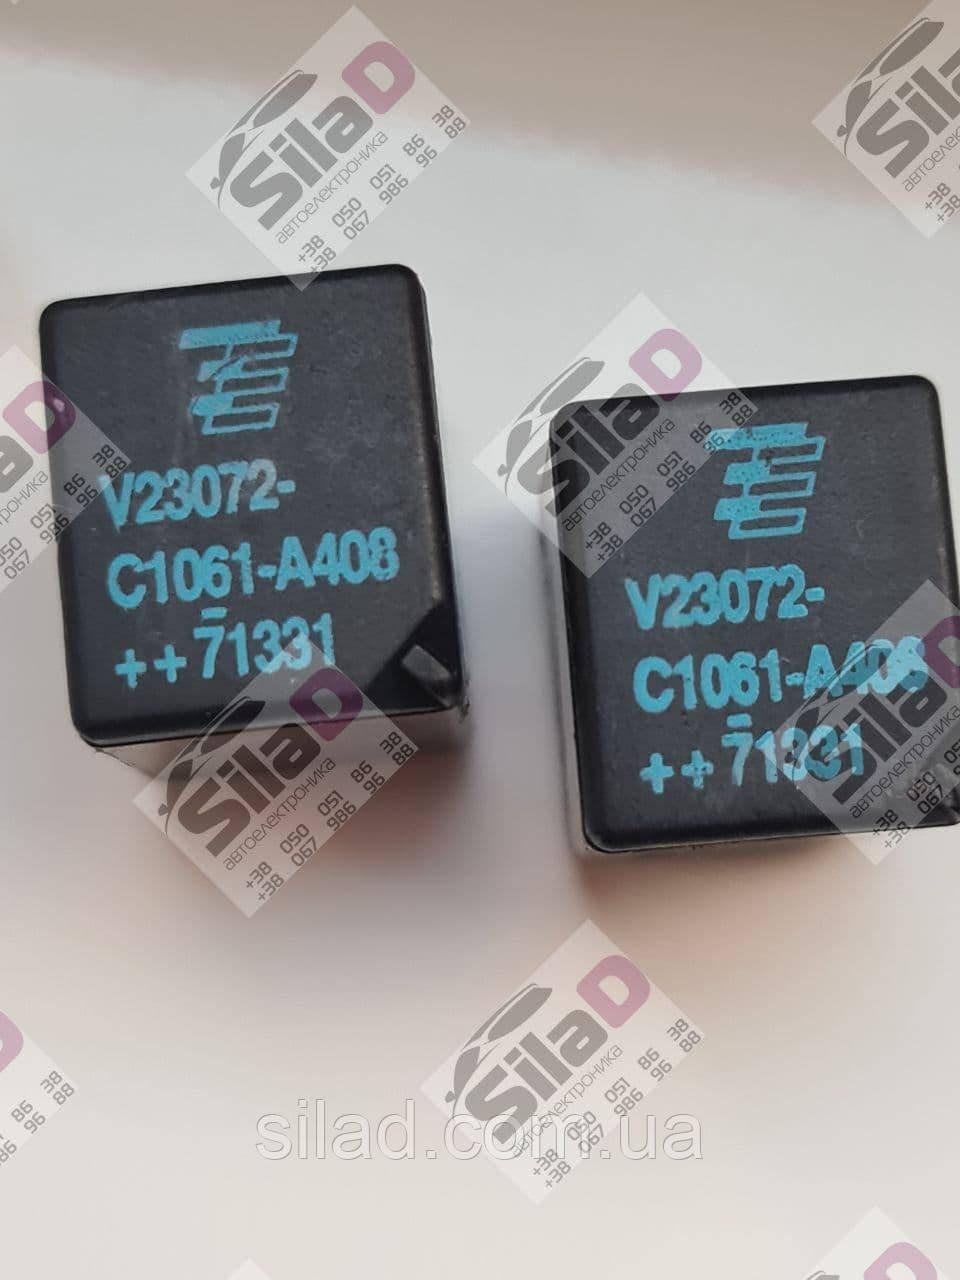 Реле V23072-C1061-A408 Tyco Electronics DIP5